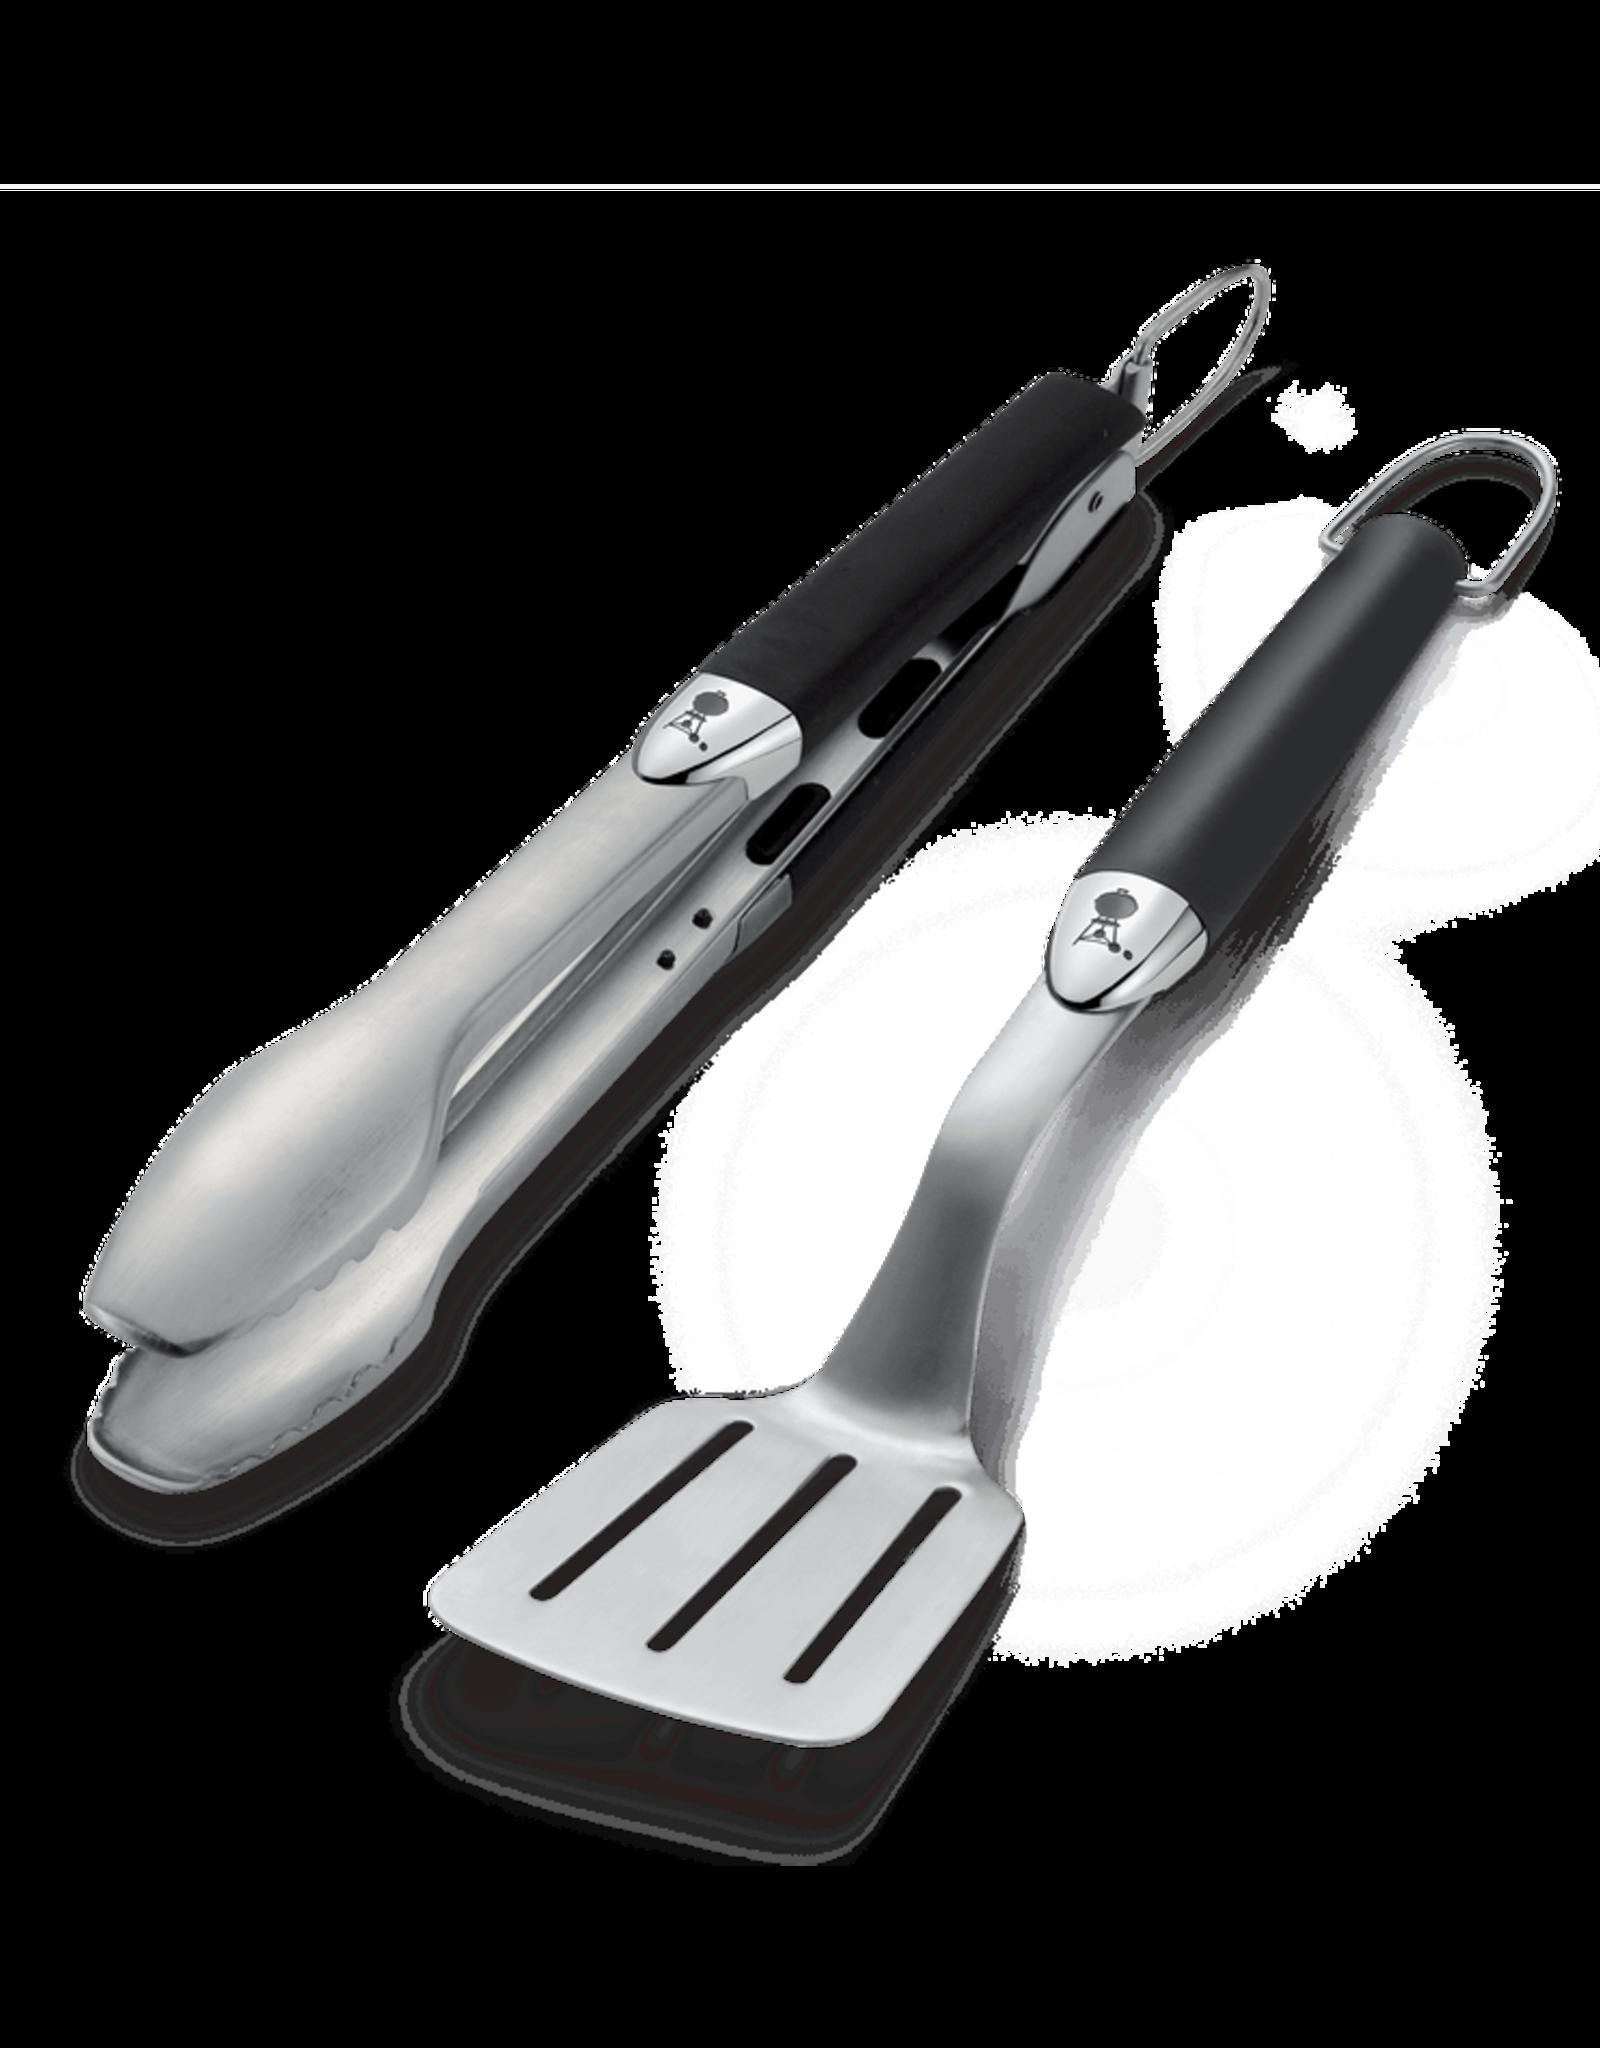 Weber Premium Tool Set - Compact